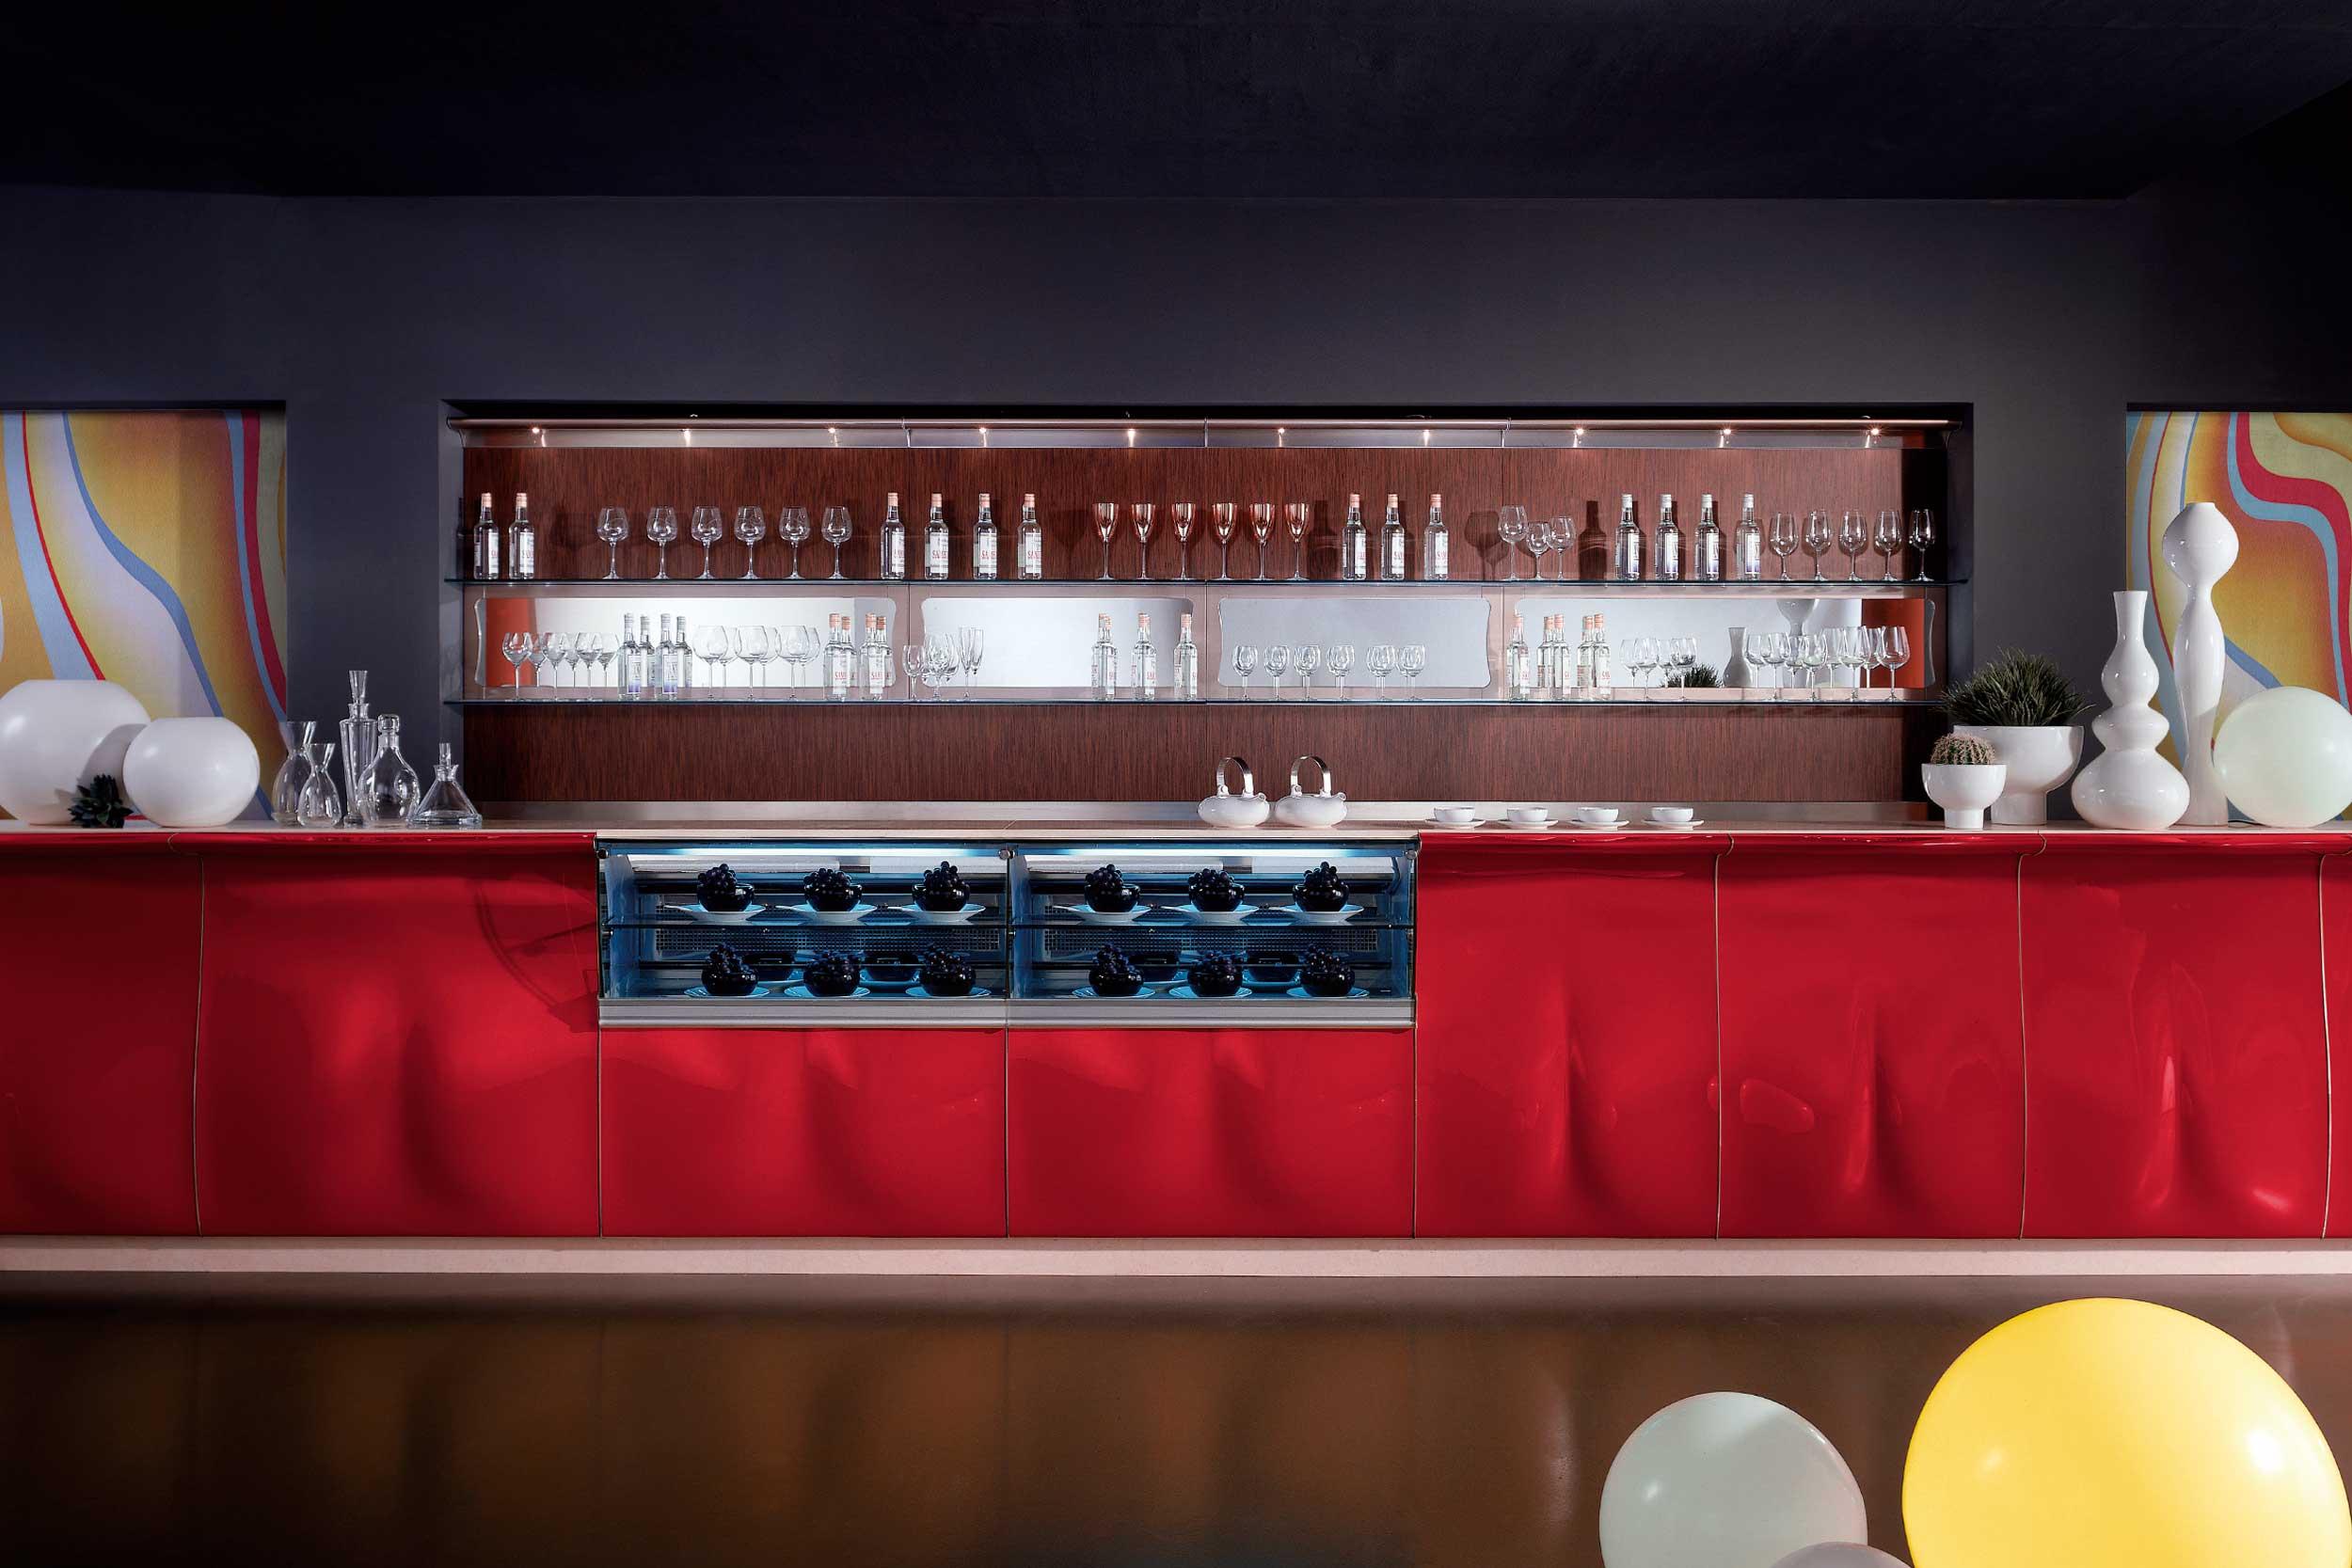 Arredo lucky arredamento per bar artic for Artic arredo bar